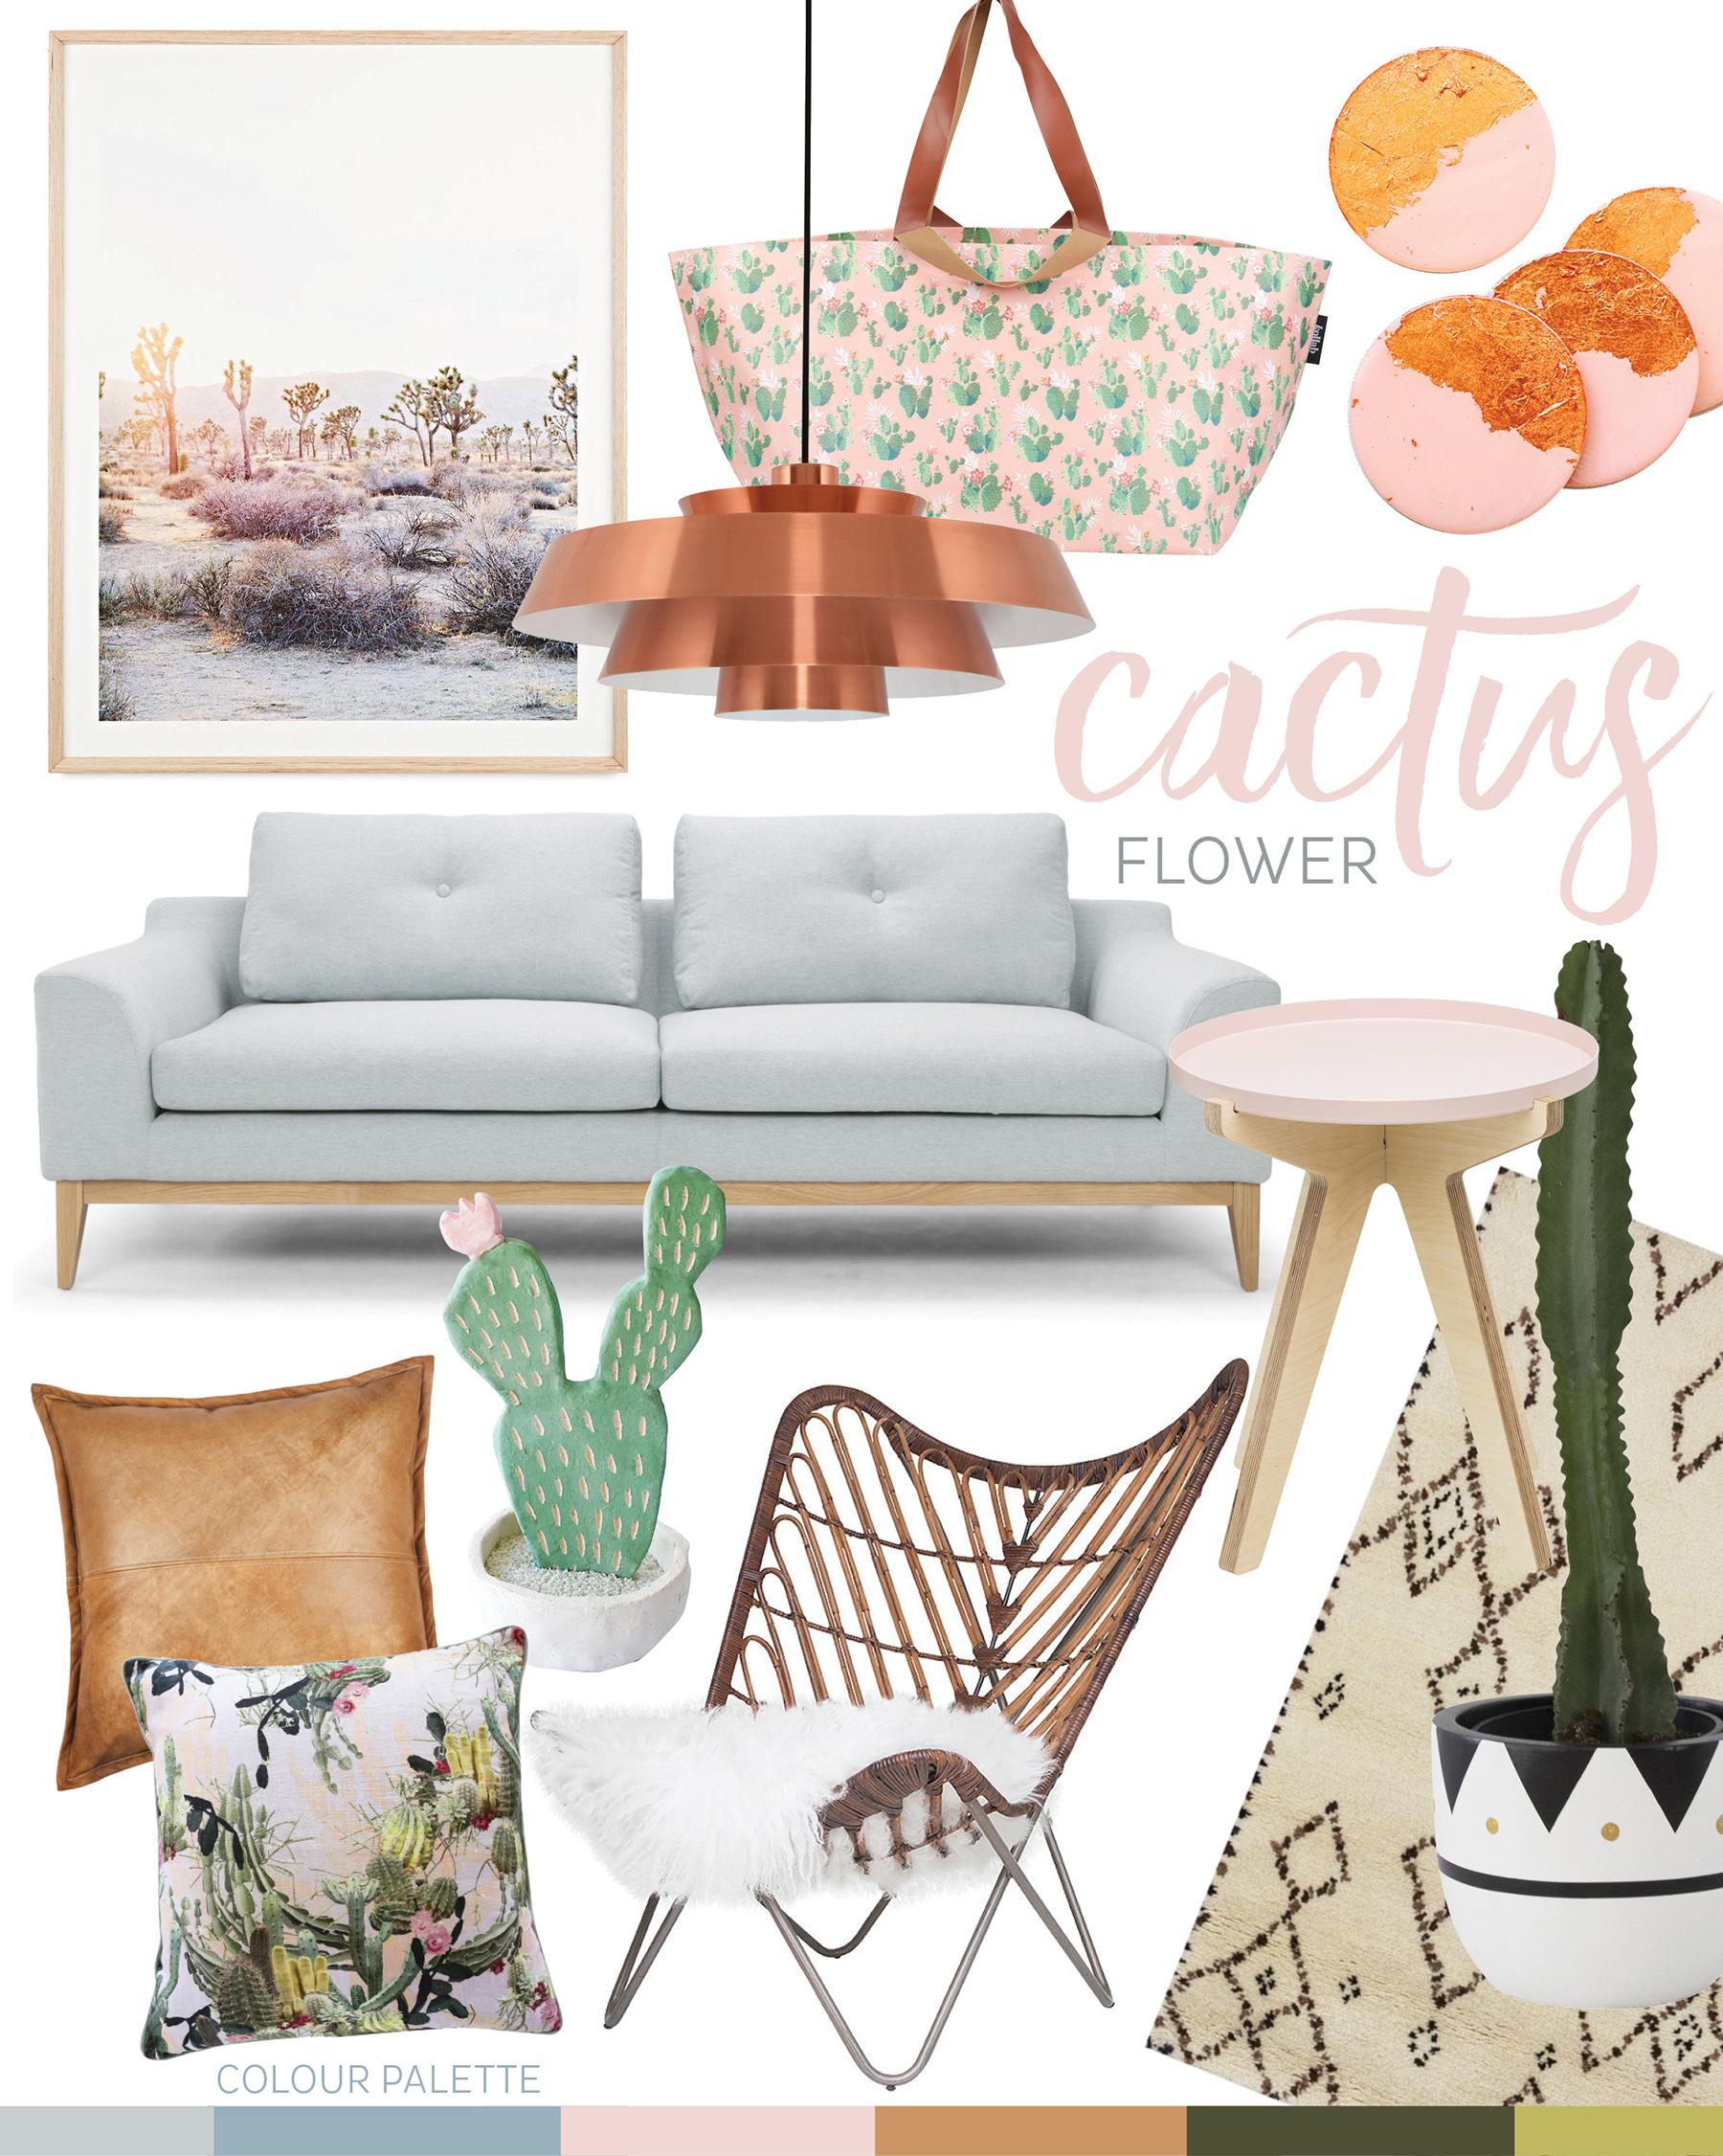 1adorehomemagazineblog_product_trend_homewares_cactus_flower_desert_dusty_pink_copper_leather_grey.jpg